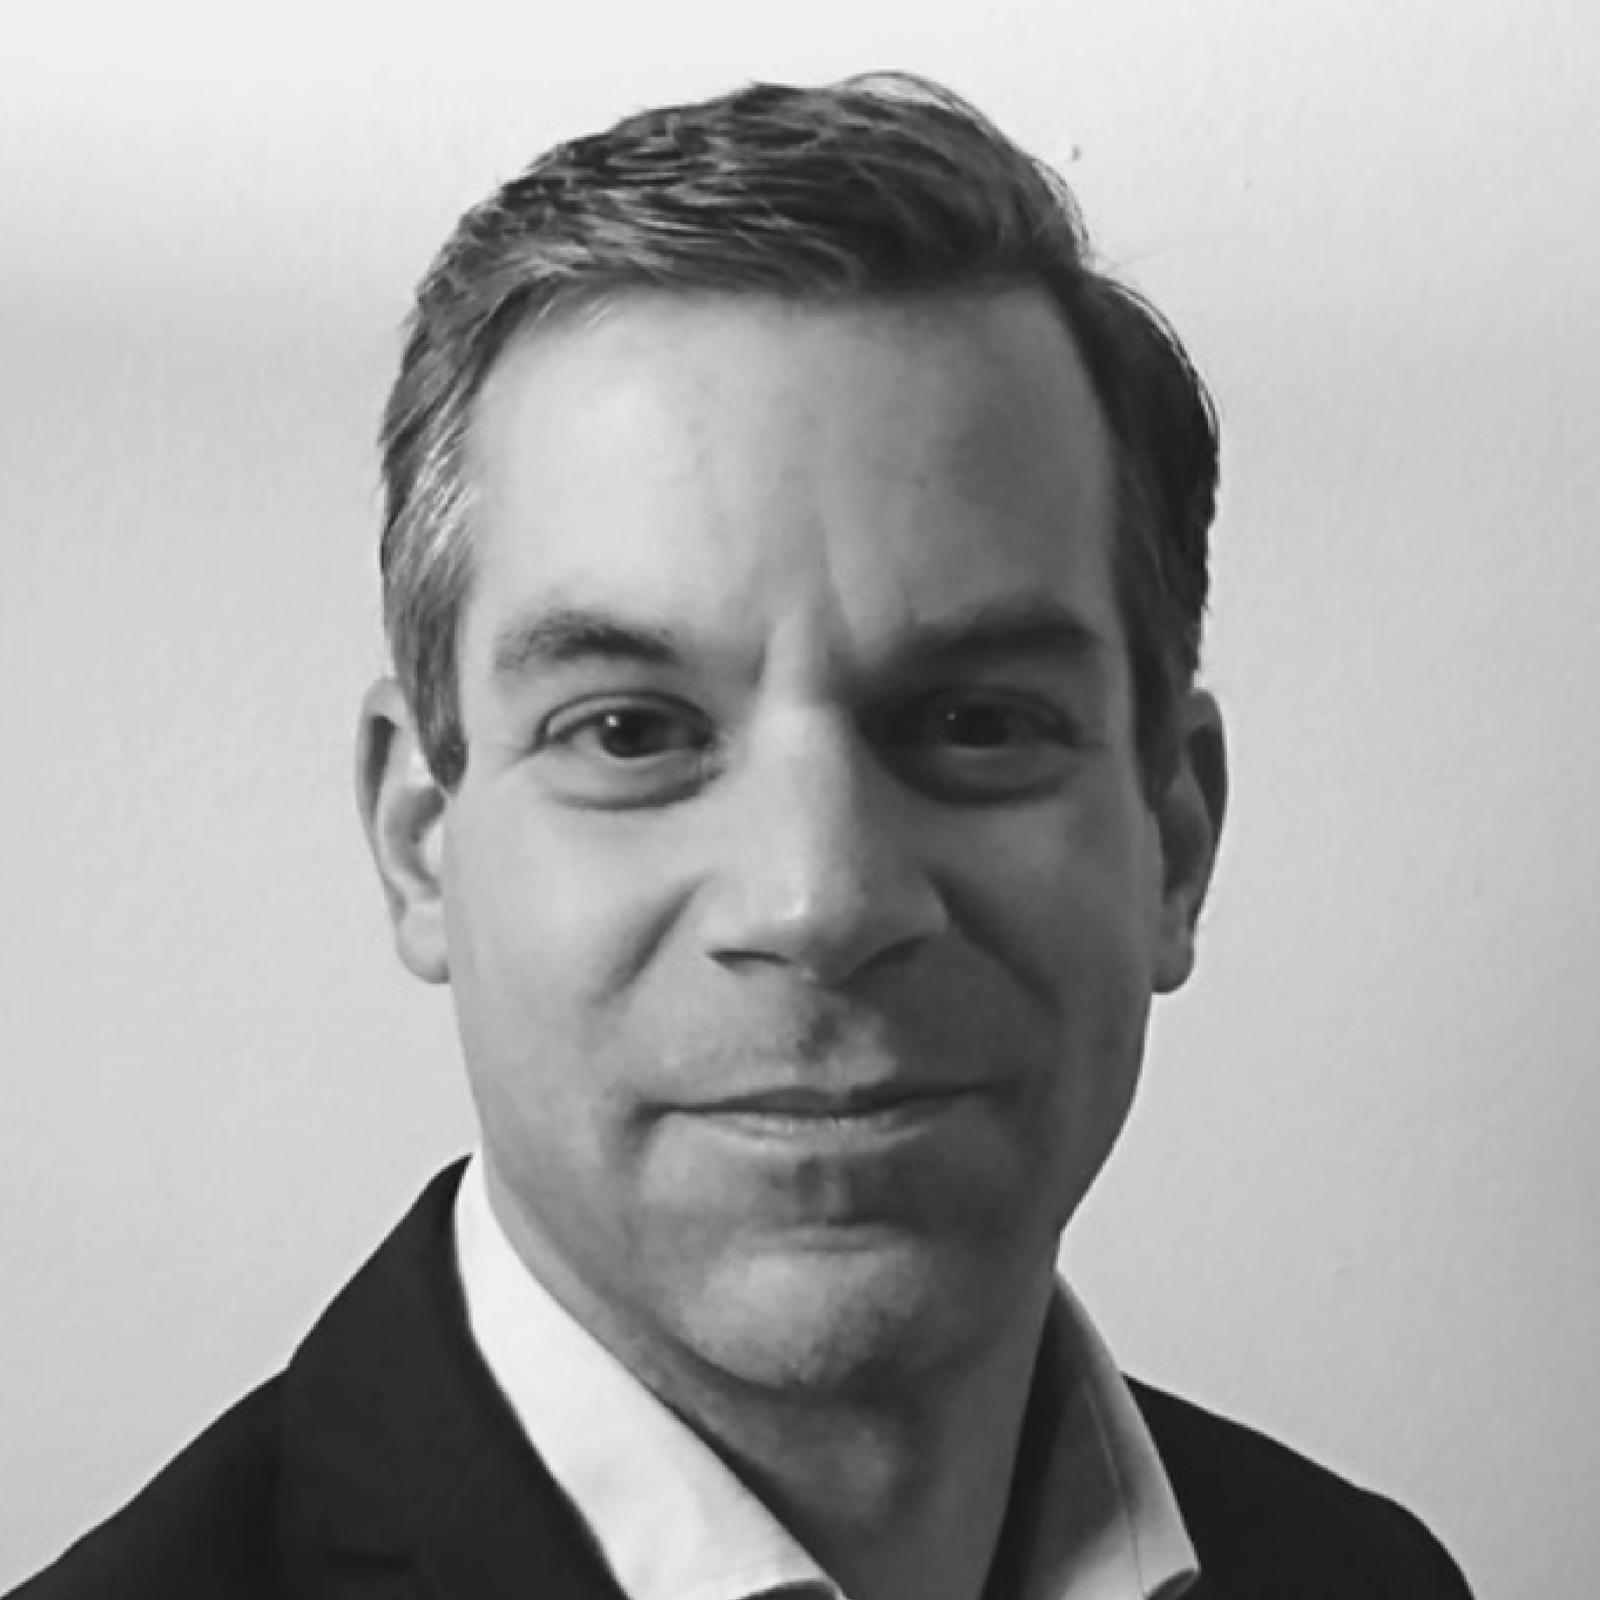 Jérôme Croisier - Chief Art Officer, Maecenas